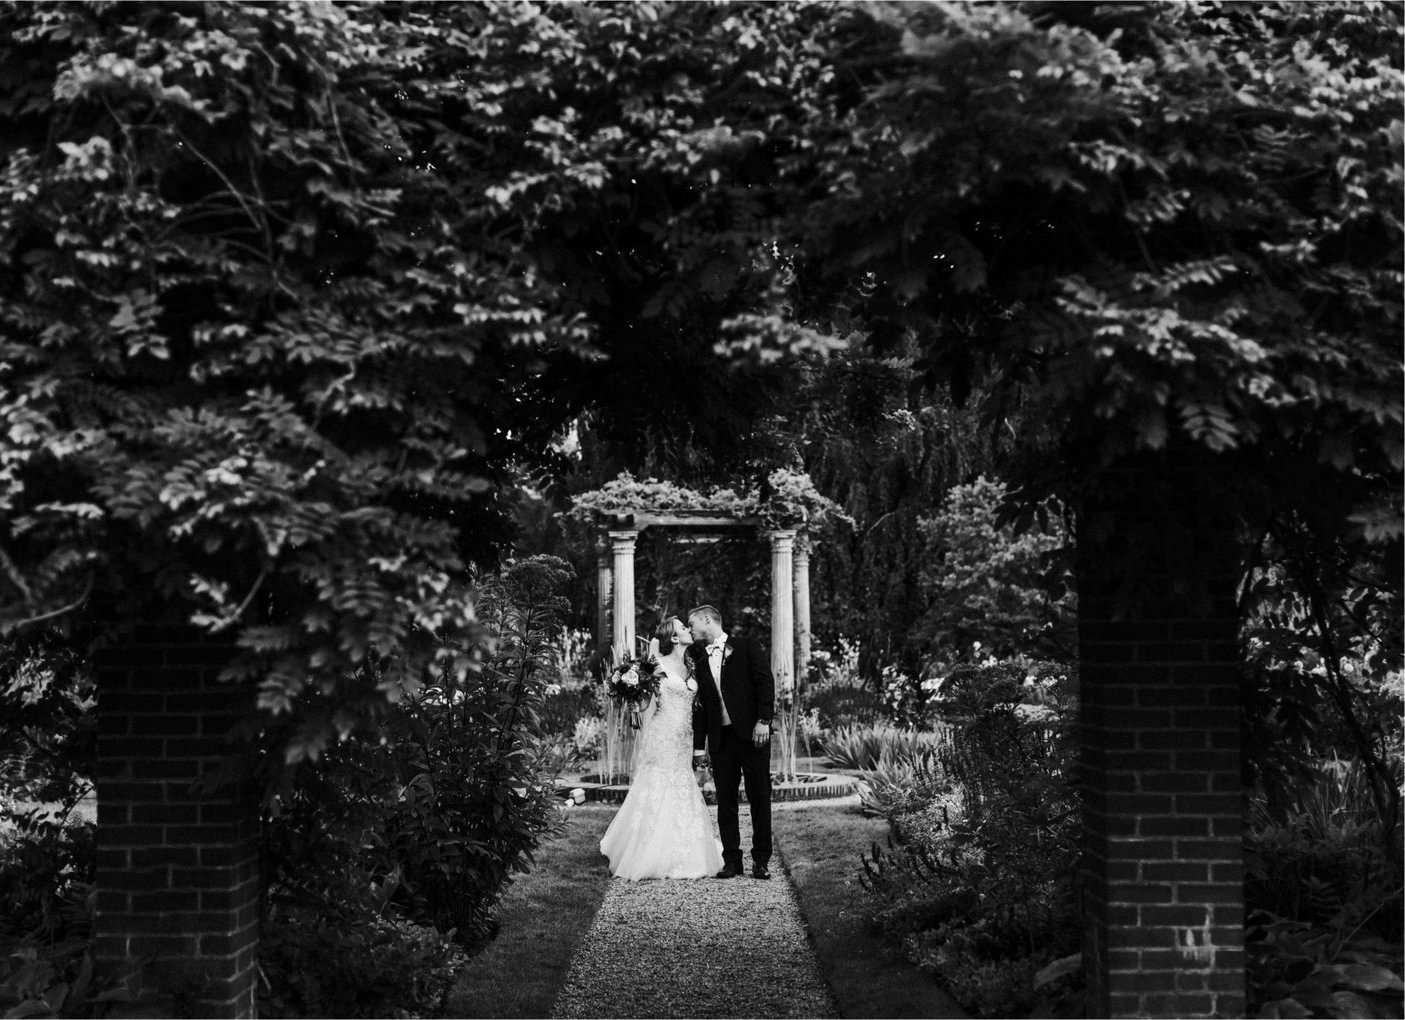 Lena_Mirisola_2017_Weddings_-038.jpg